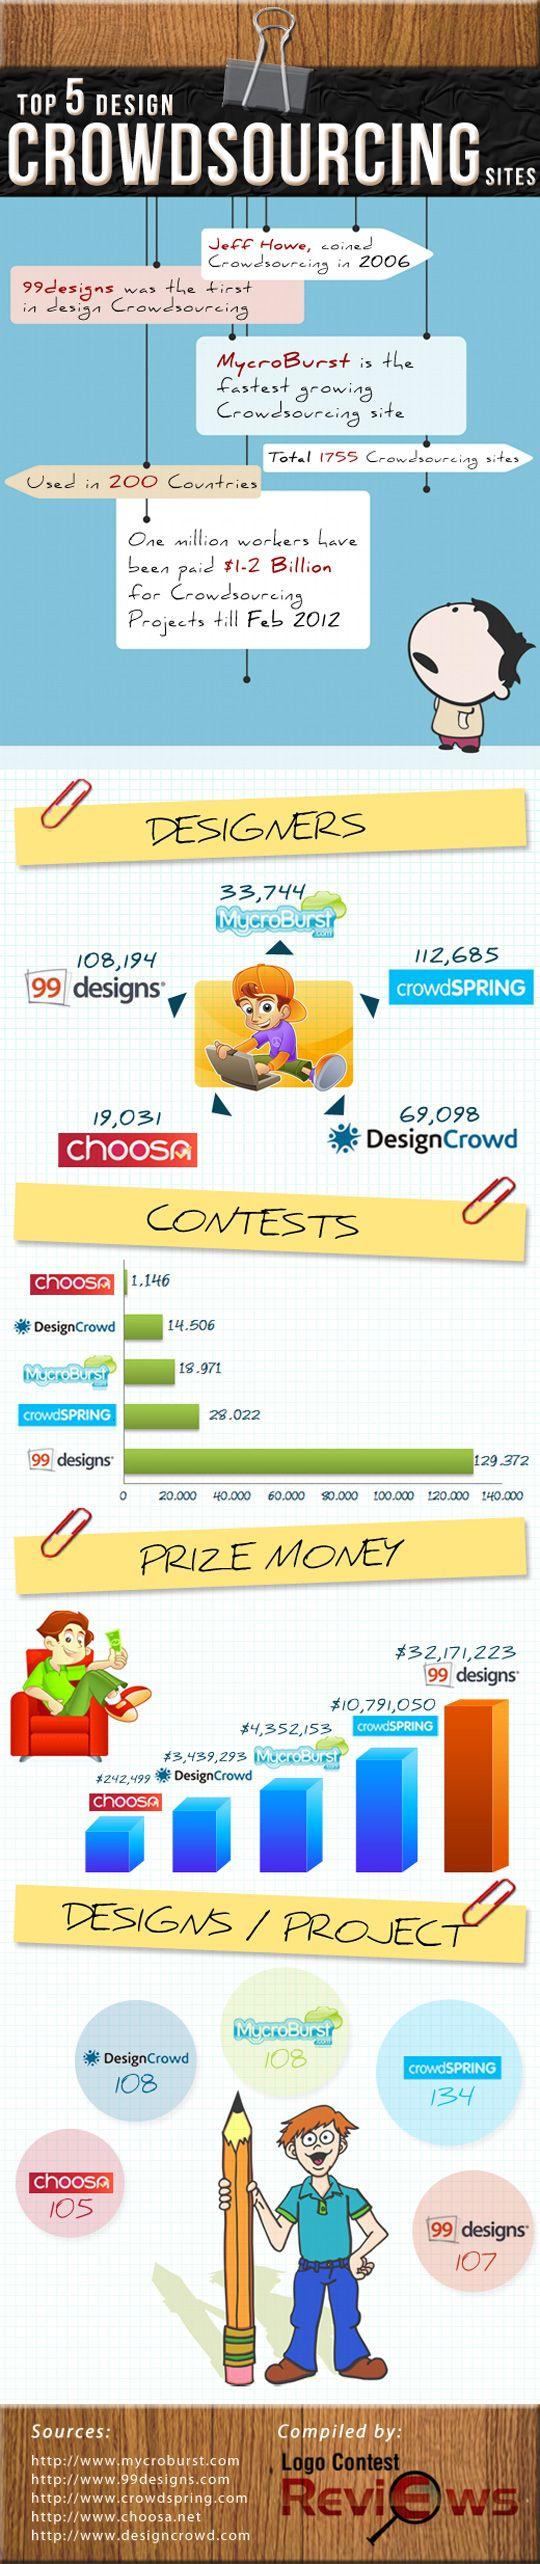 Layout photoshop web design website template tutorials tutorial 022 - Design Crowdsourcing Sites Infographic